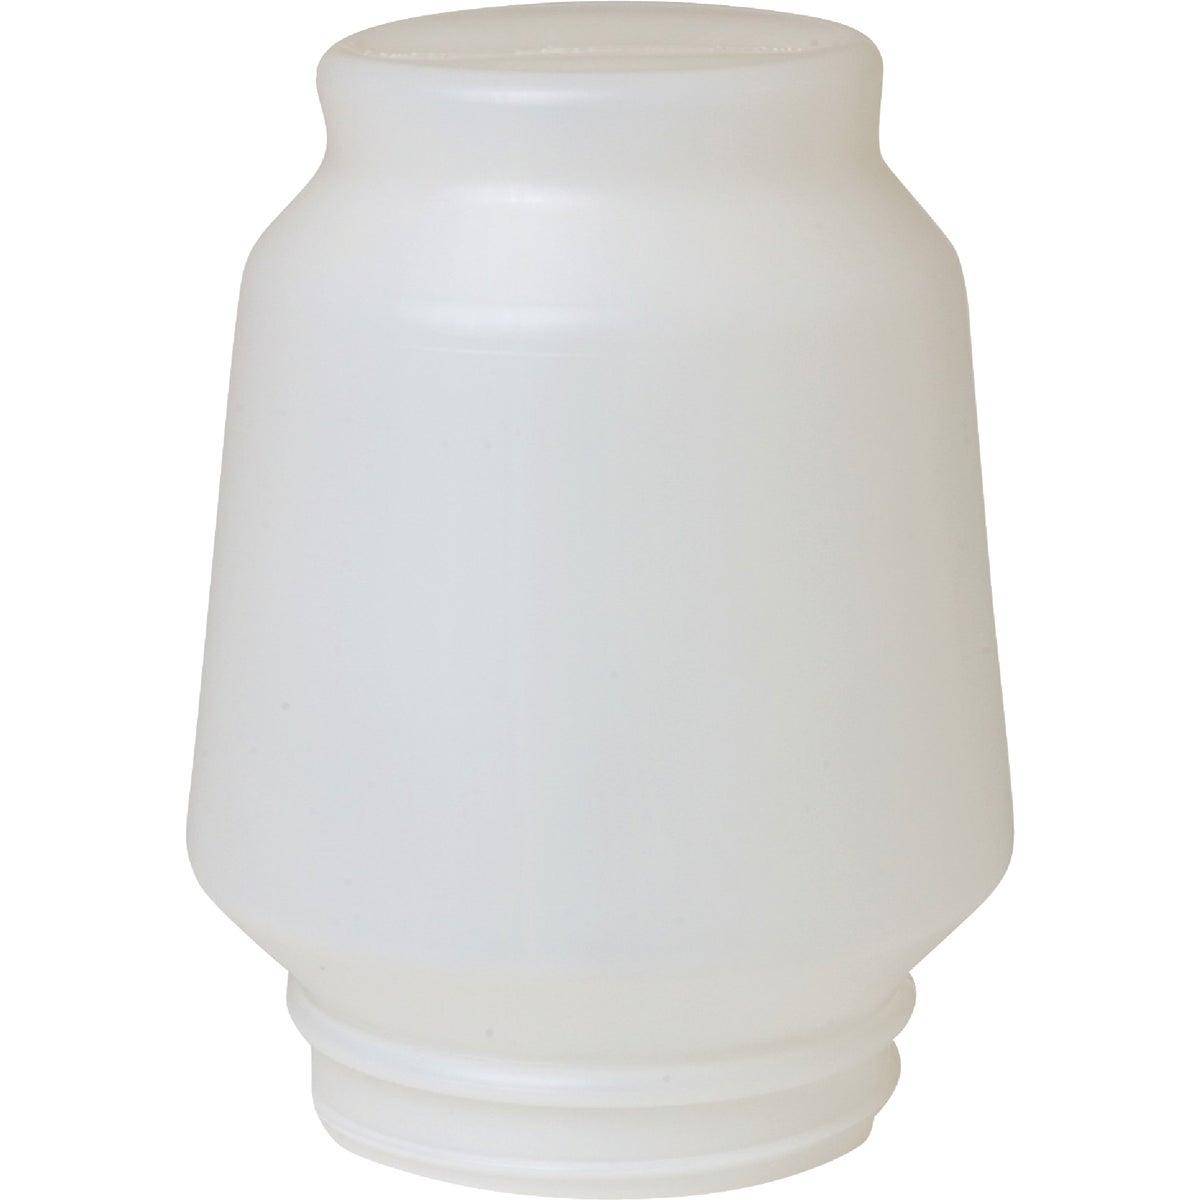 1 GALLON PLASTIC JAR